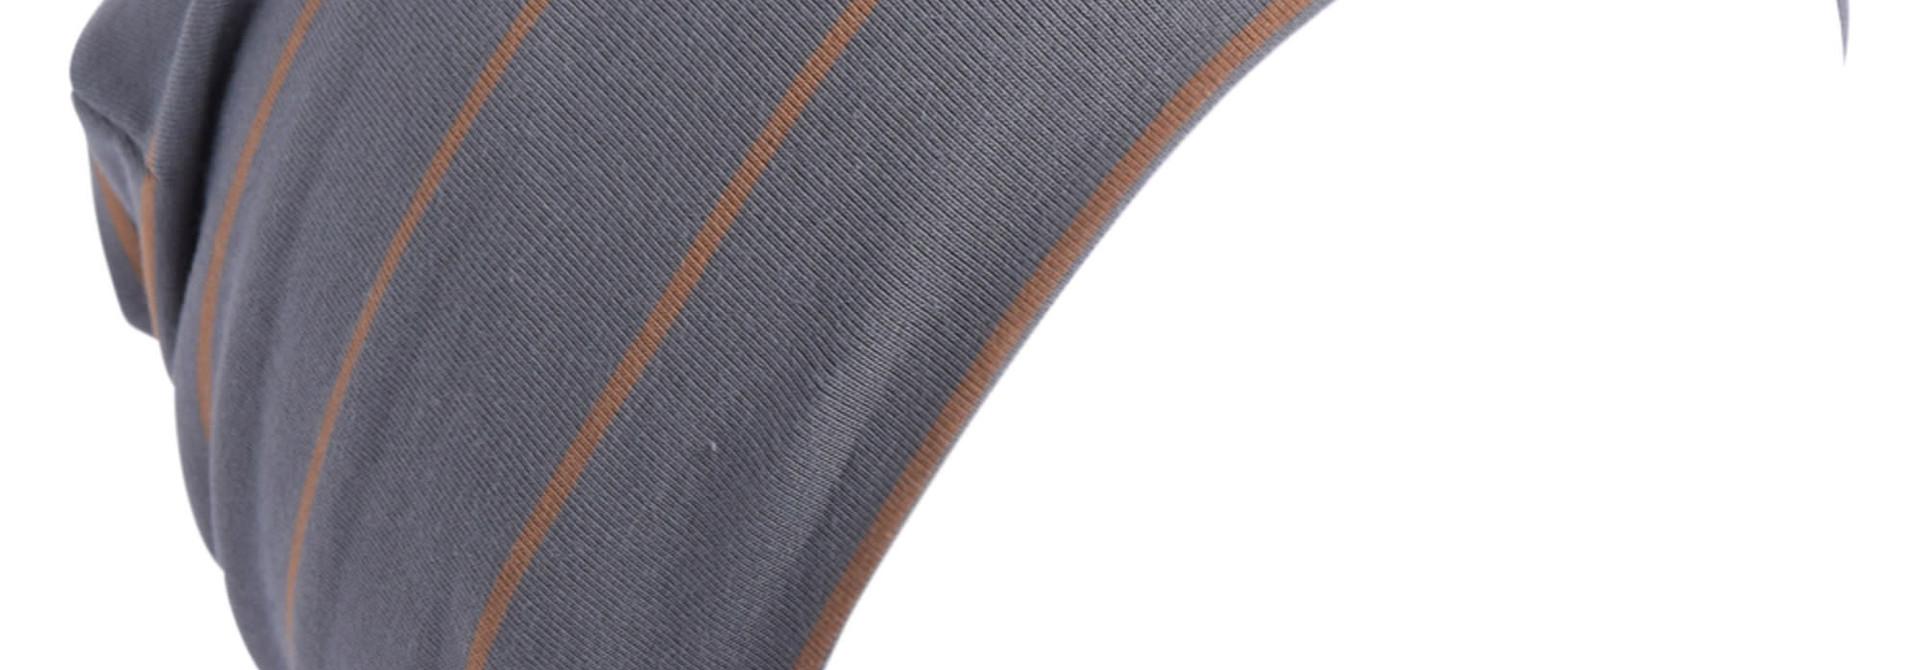 Tuque  Coton - BOSTON V20 Gris Taupe